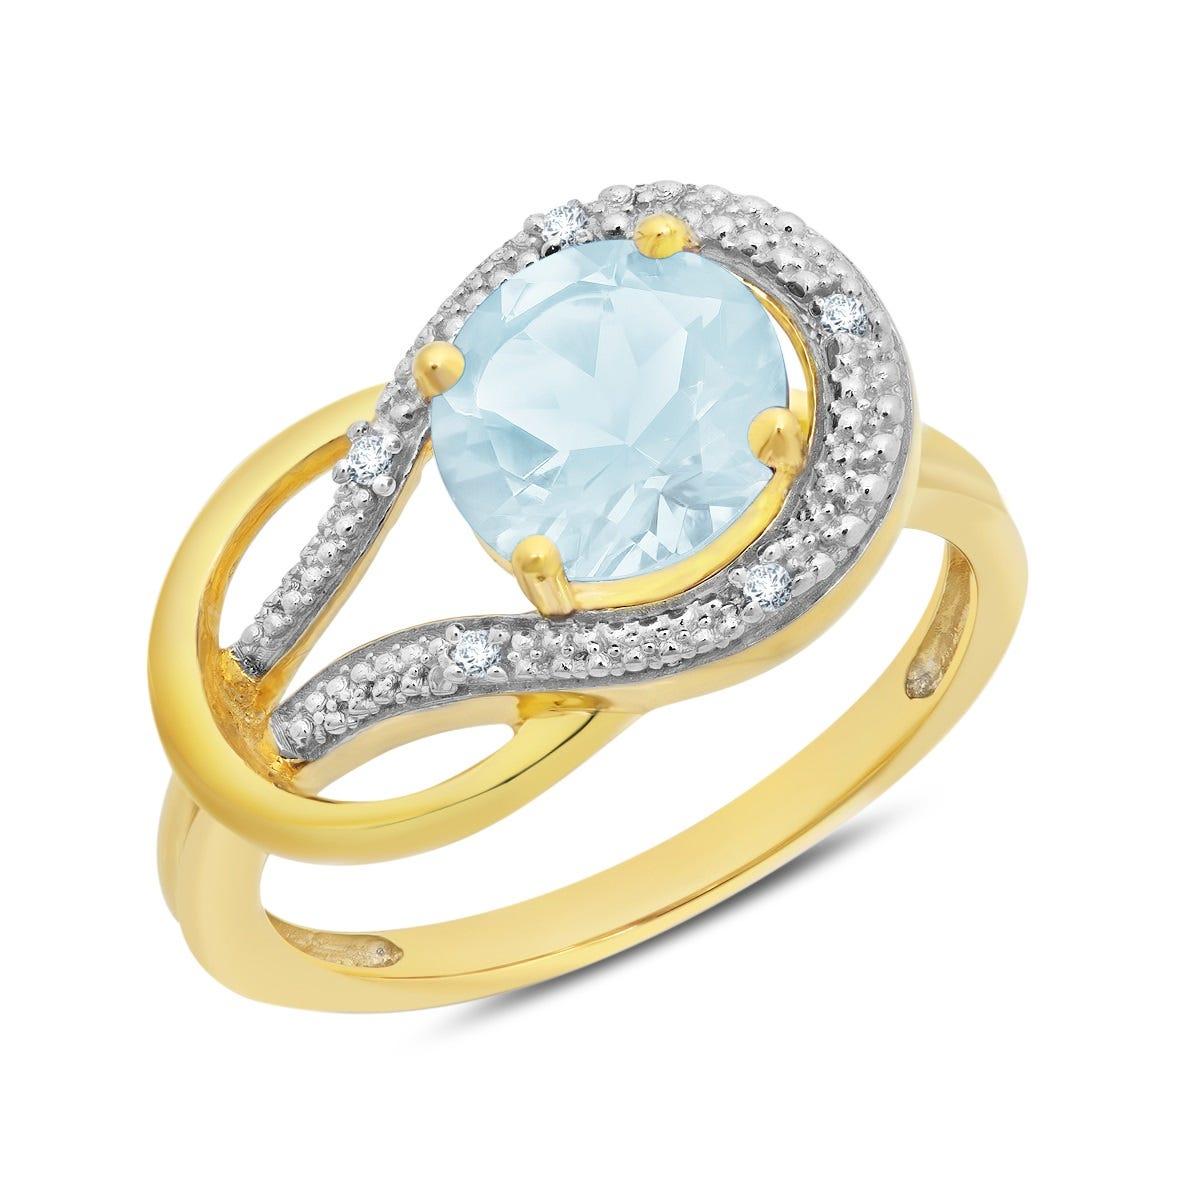 Aquamarine & Diamond Love Knot Ring in 10k Yellow Gold